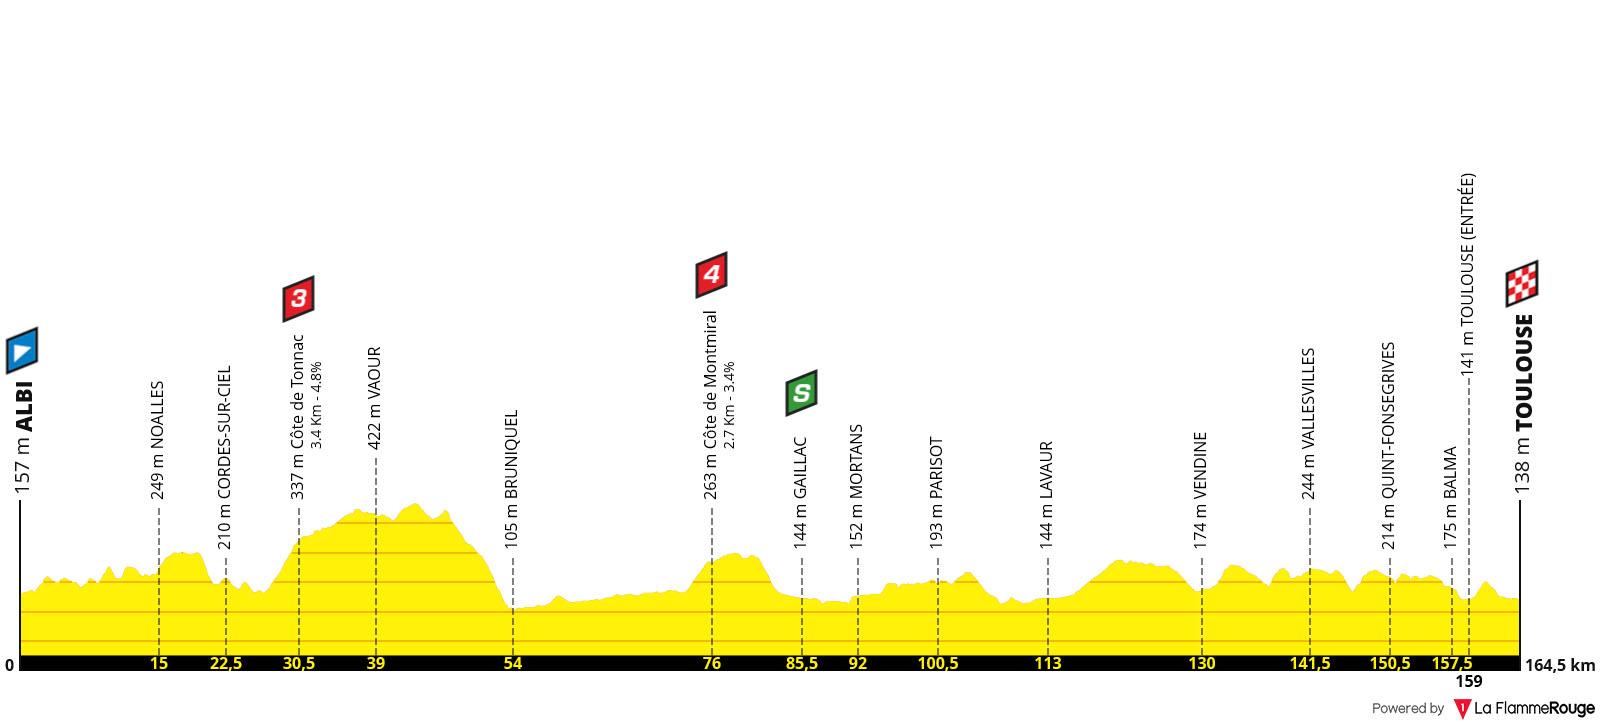 Perfil Etapa 11 - Tour de Francia 2019